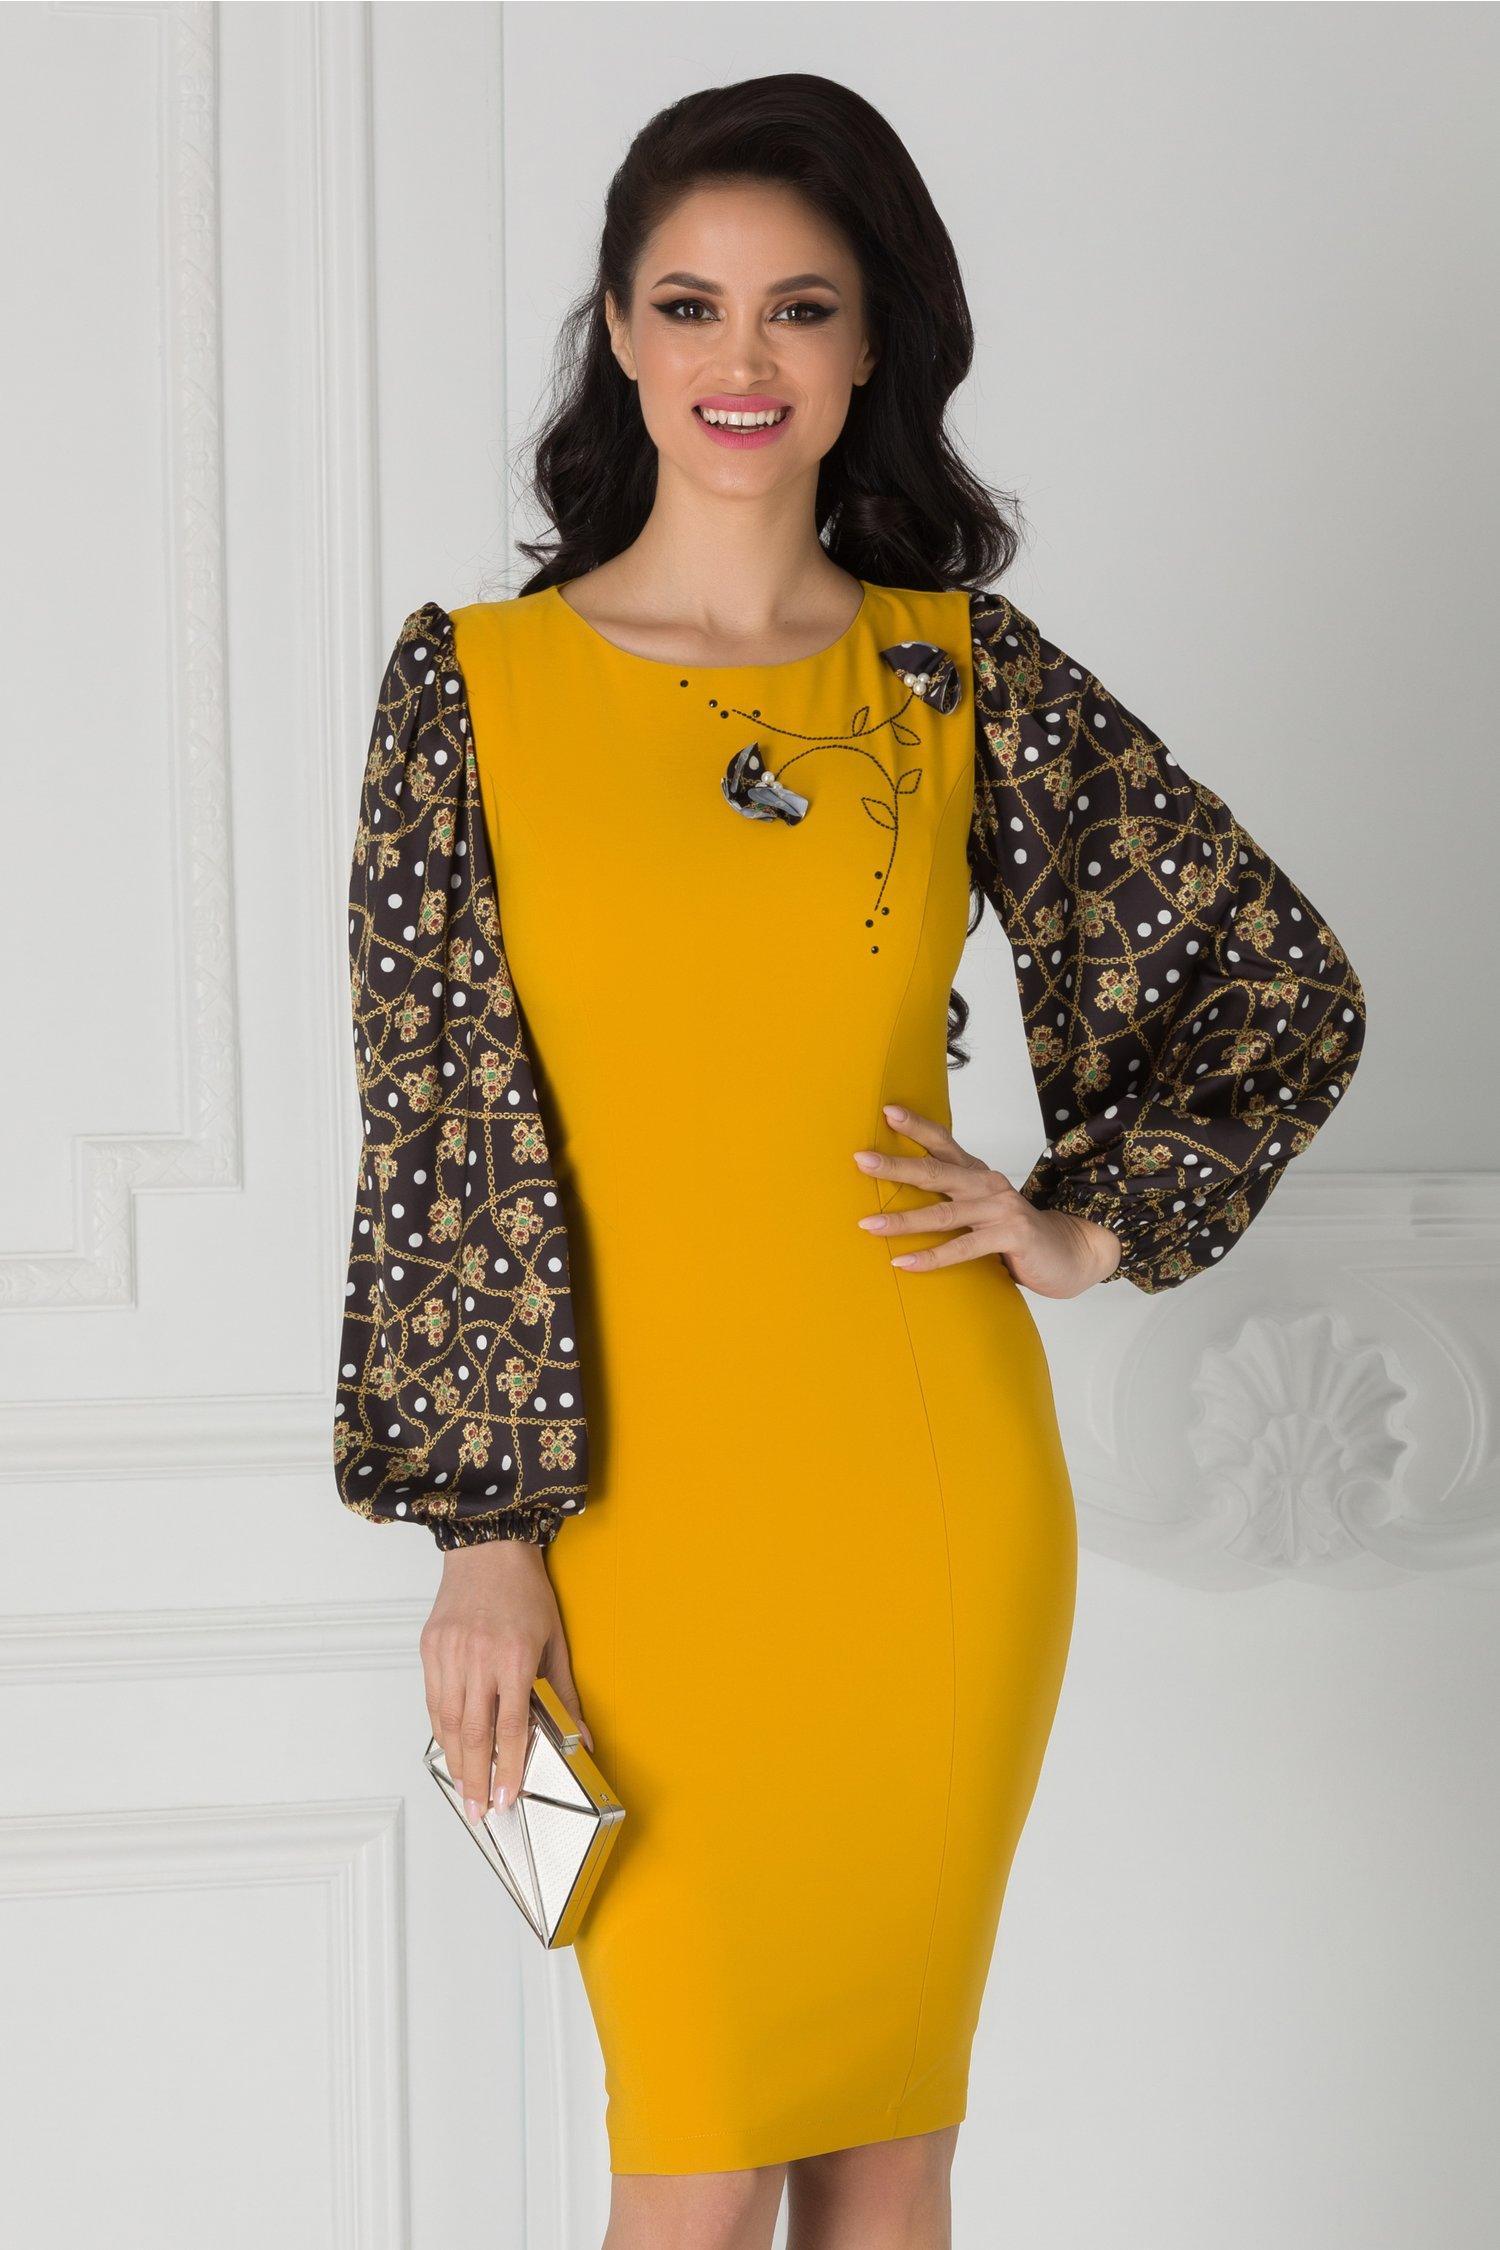 Rochie LaDonna galben mustar cu maneci negre si imprimeuri